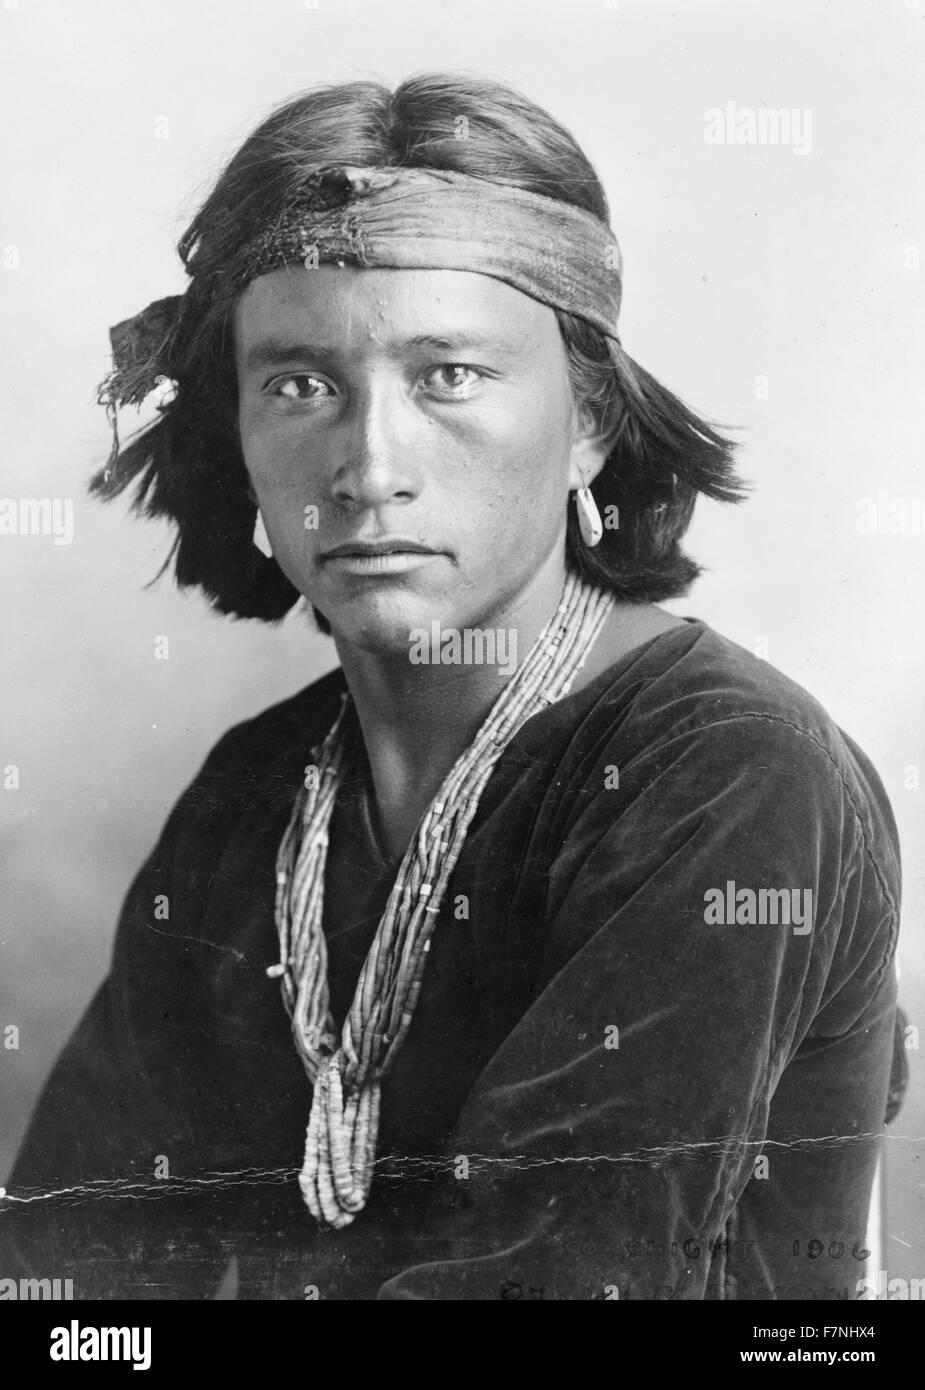 native american navajo boy 1906 stock photo 90829484 alamy